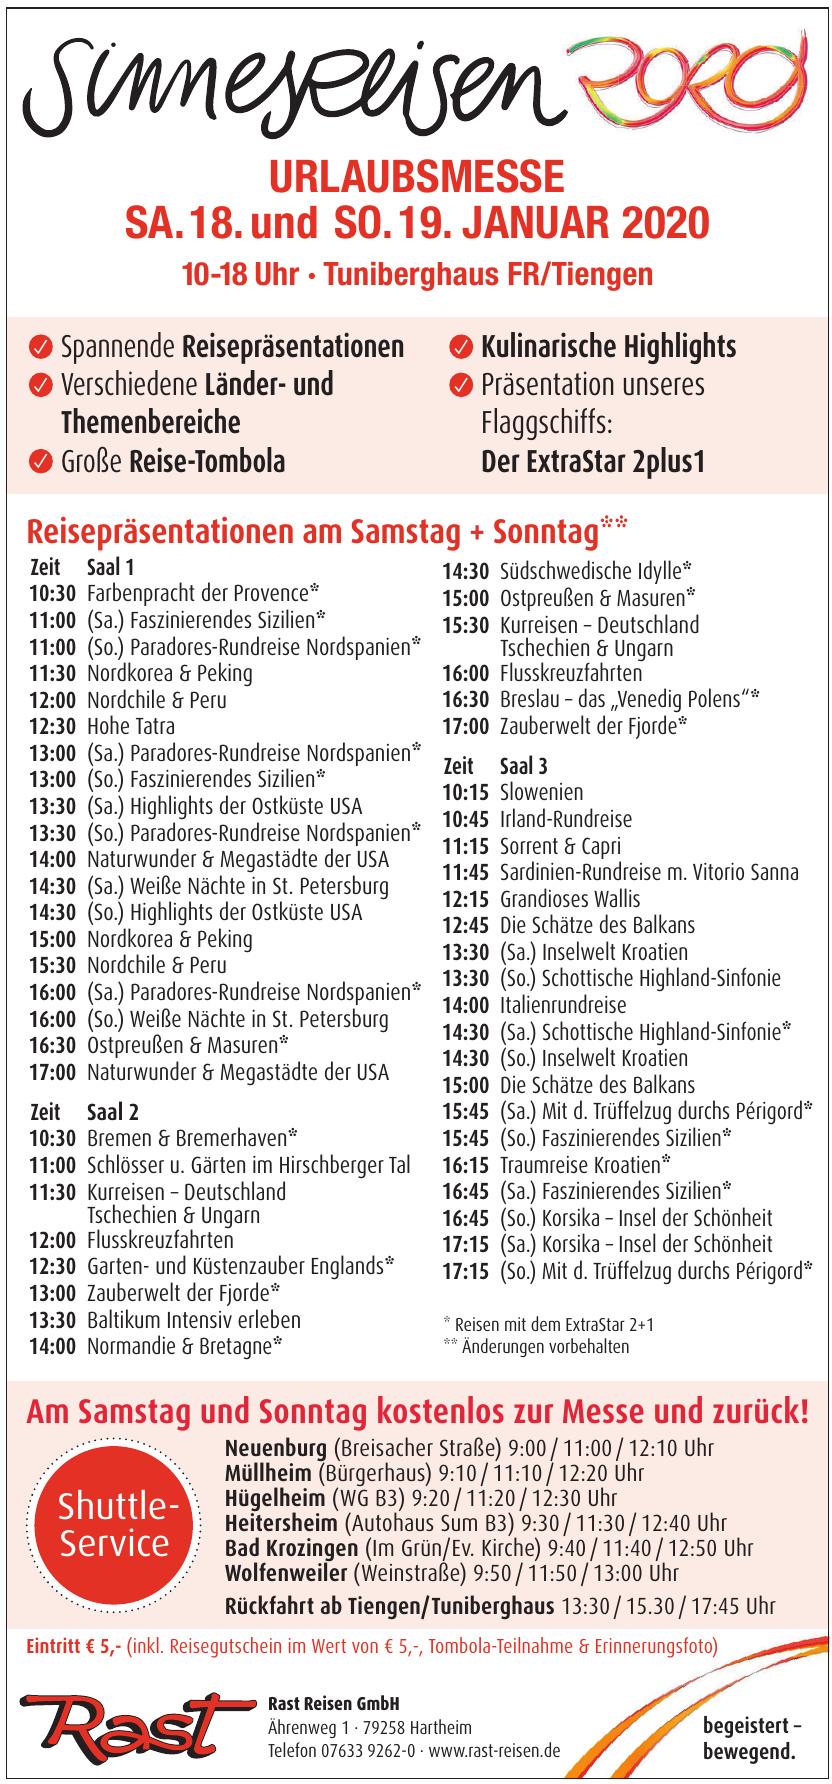 RAST Reisen GmbH